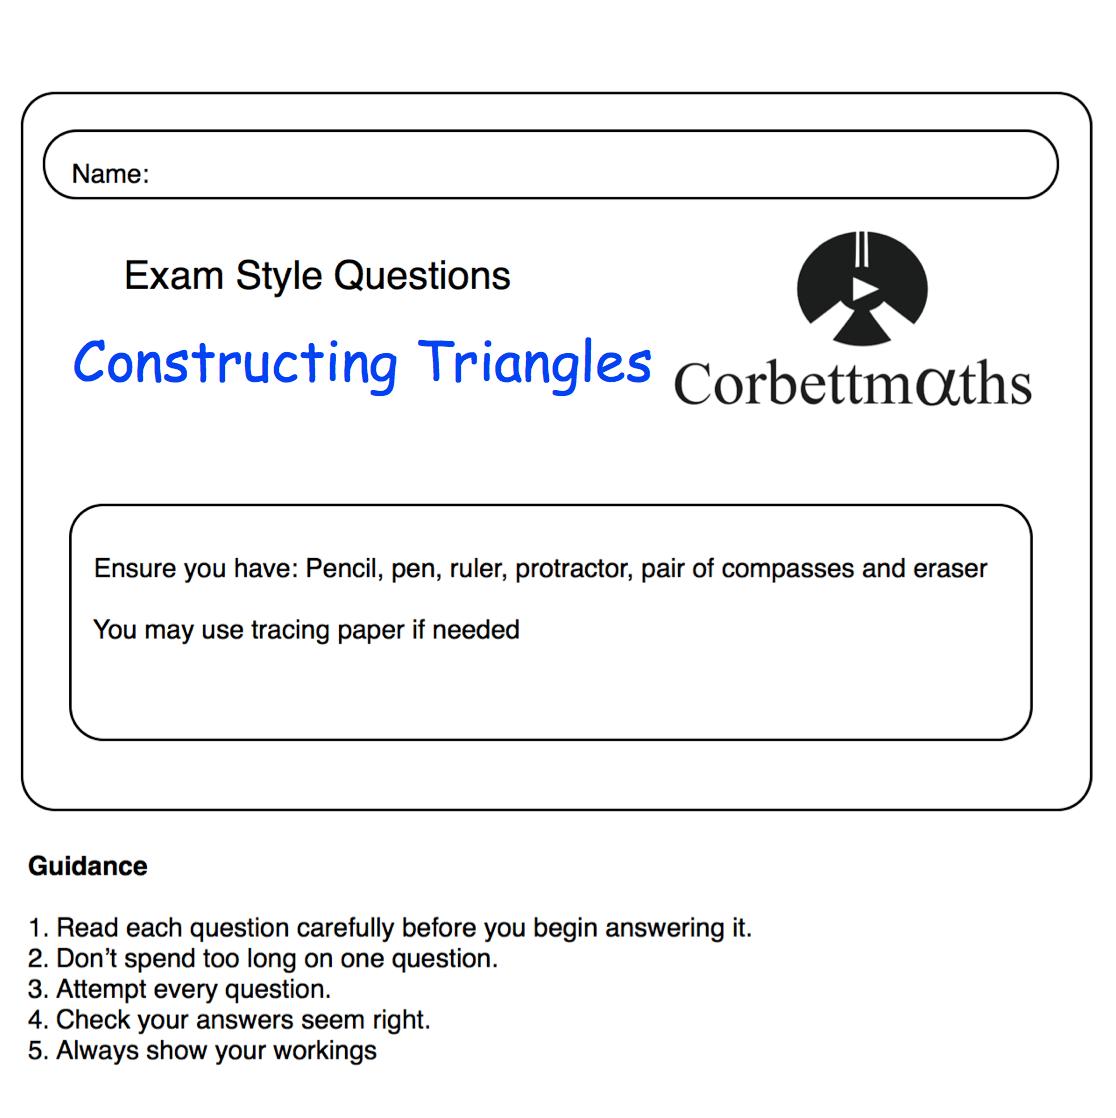 medium resolution of Constructing Triangles Practice Questions – Corbettmaths